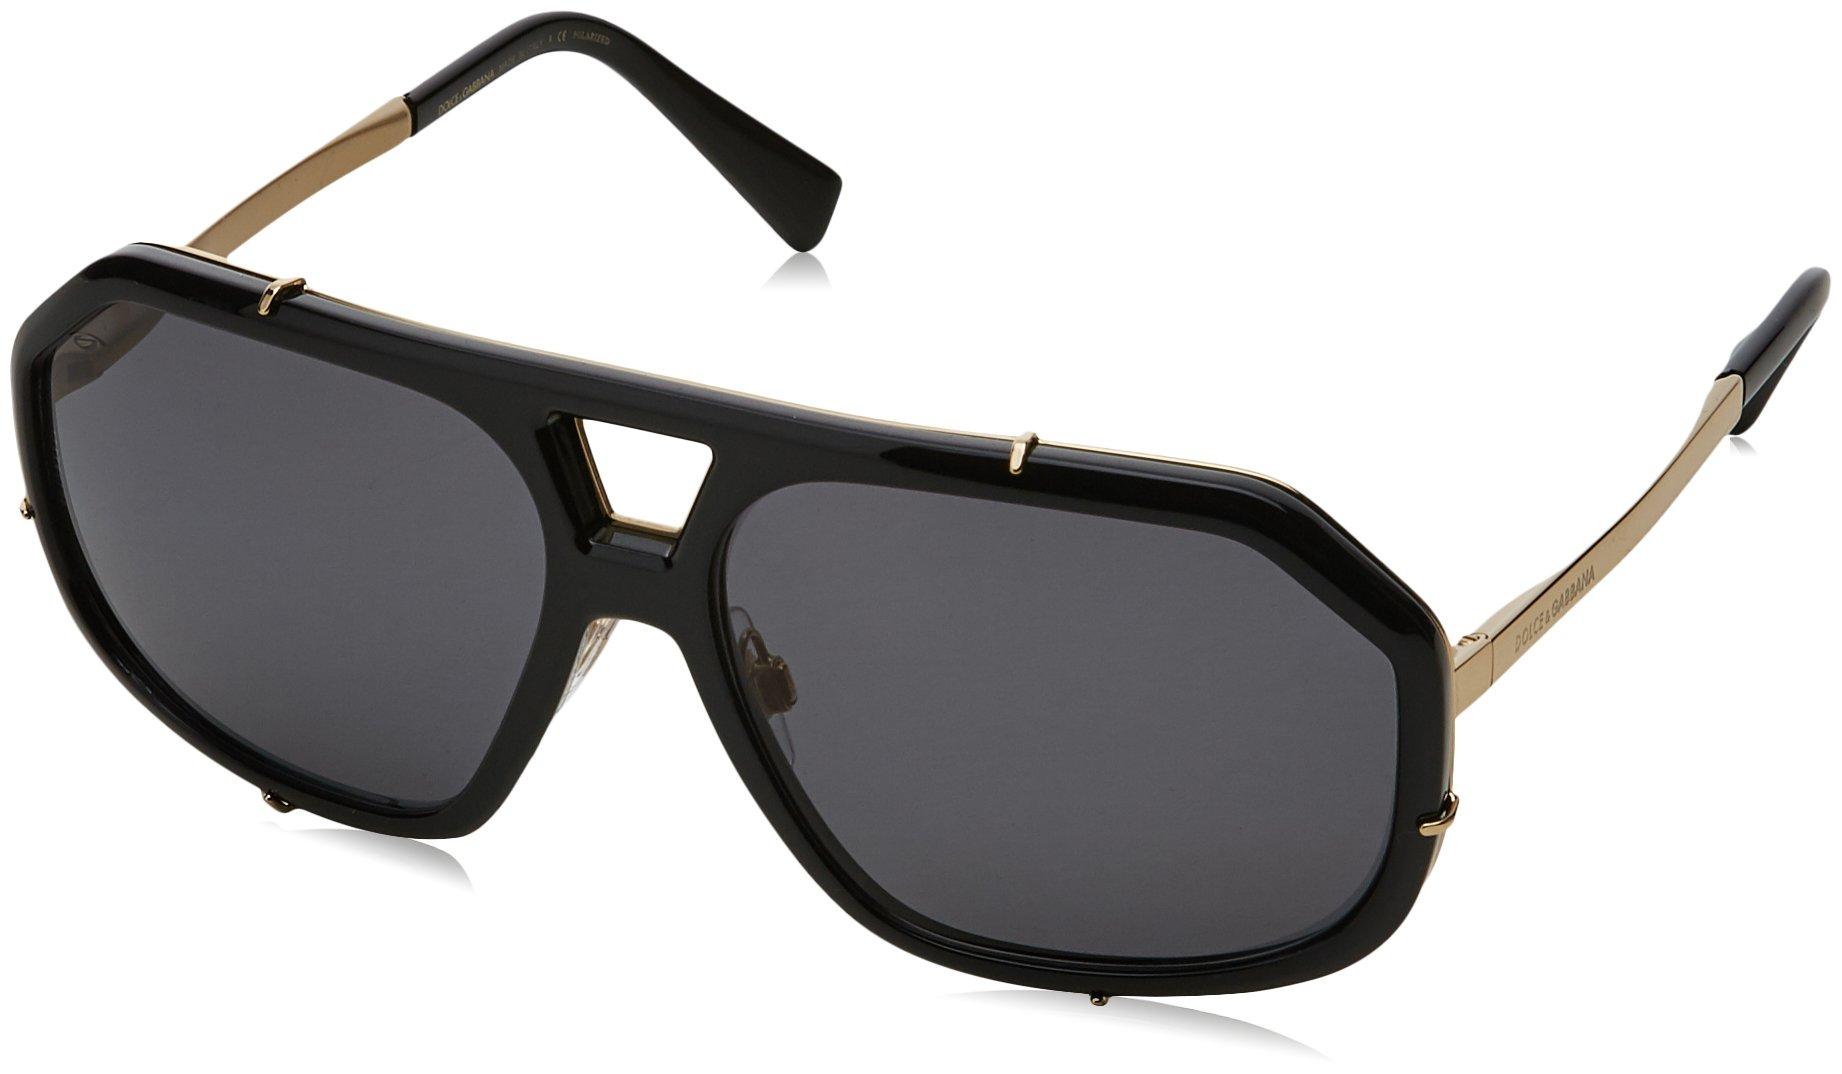 Dolce & Gabbana  Men's DG2167 Black/Polar Grey Sunglasses